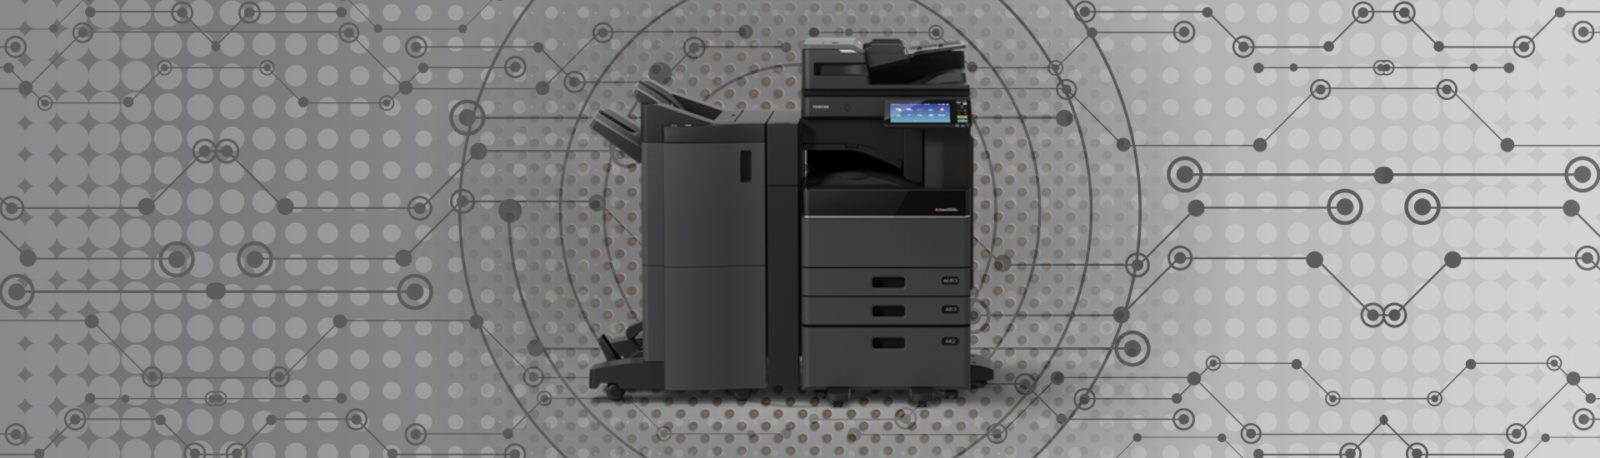 copier rentals lease a printer rent a copier south africa